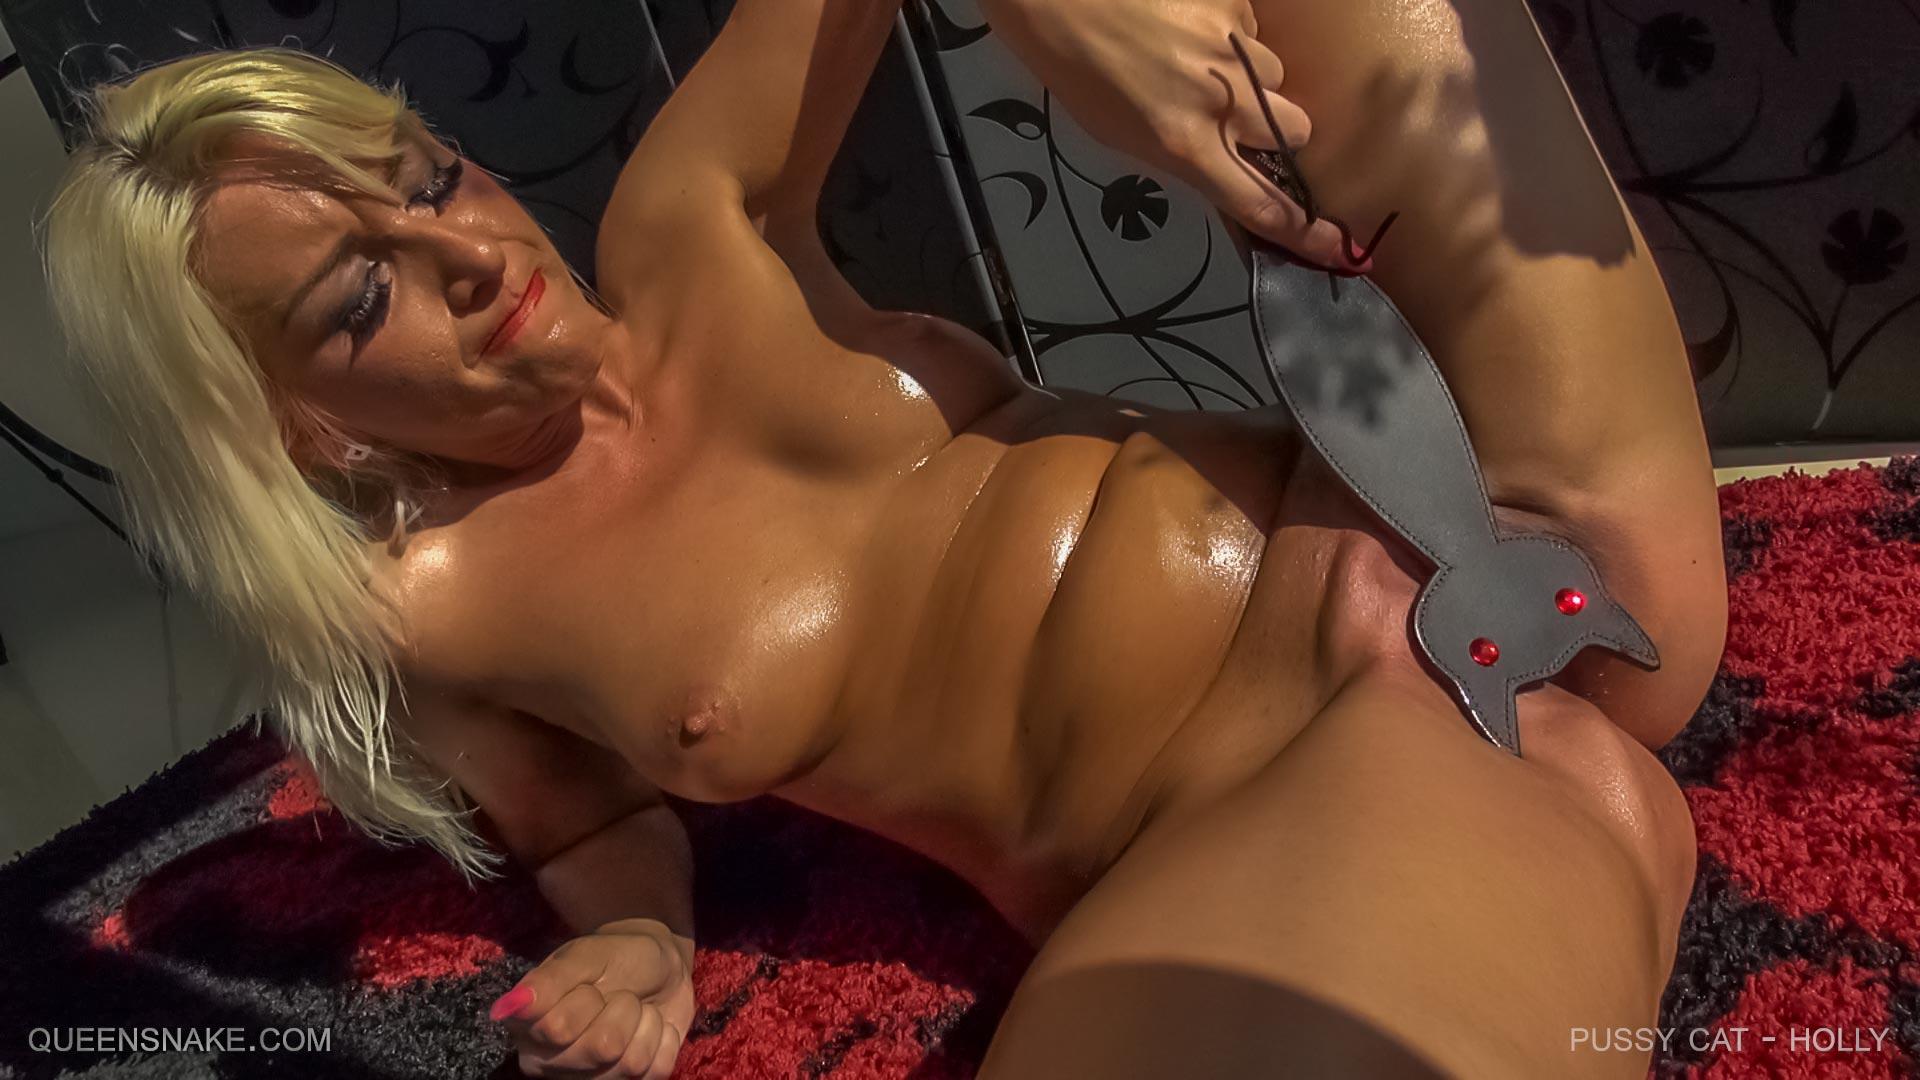 tumblr pornstarslikeitbig porn gifs